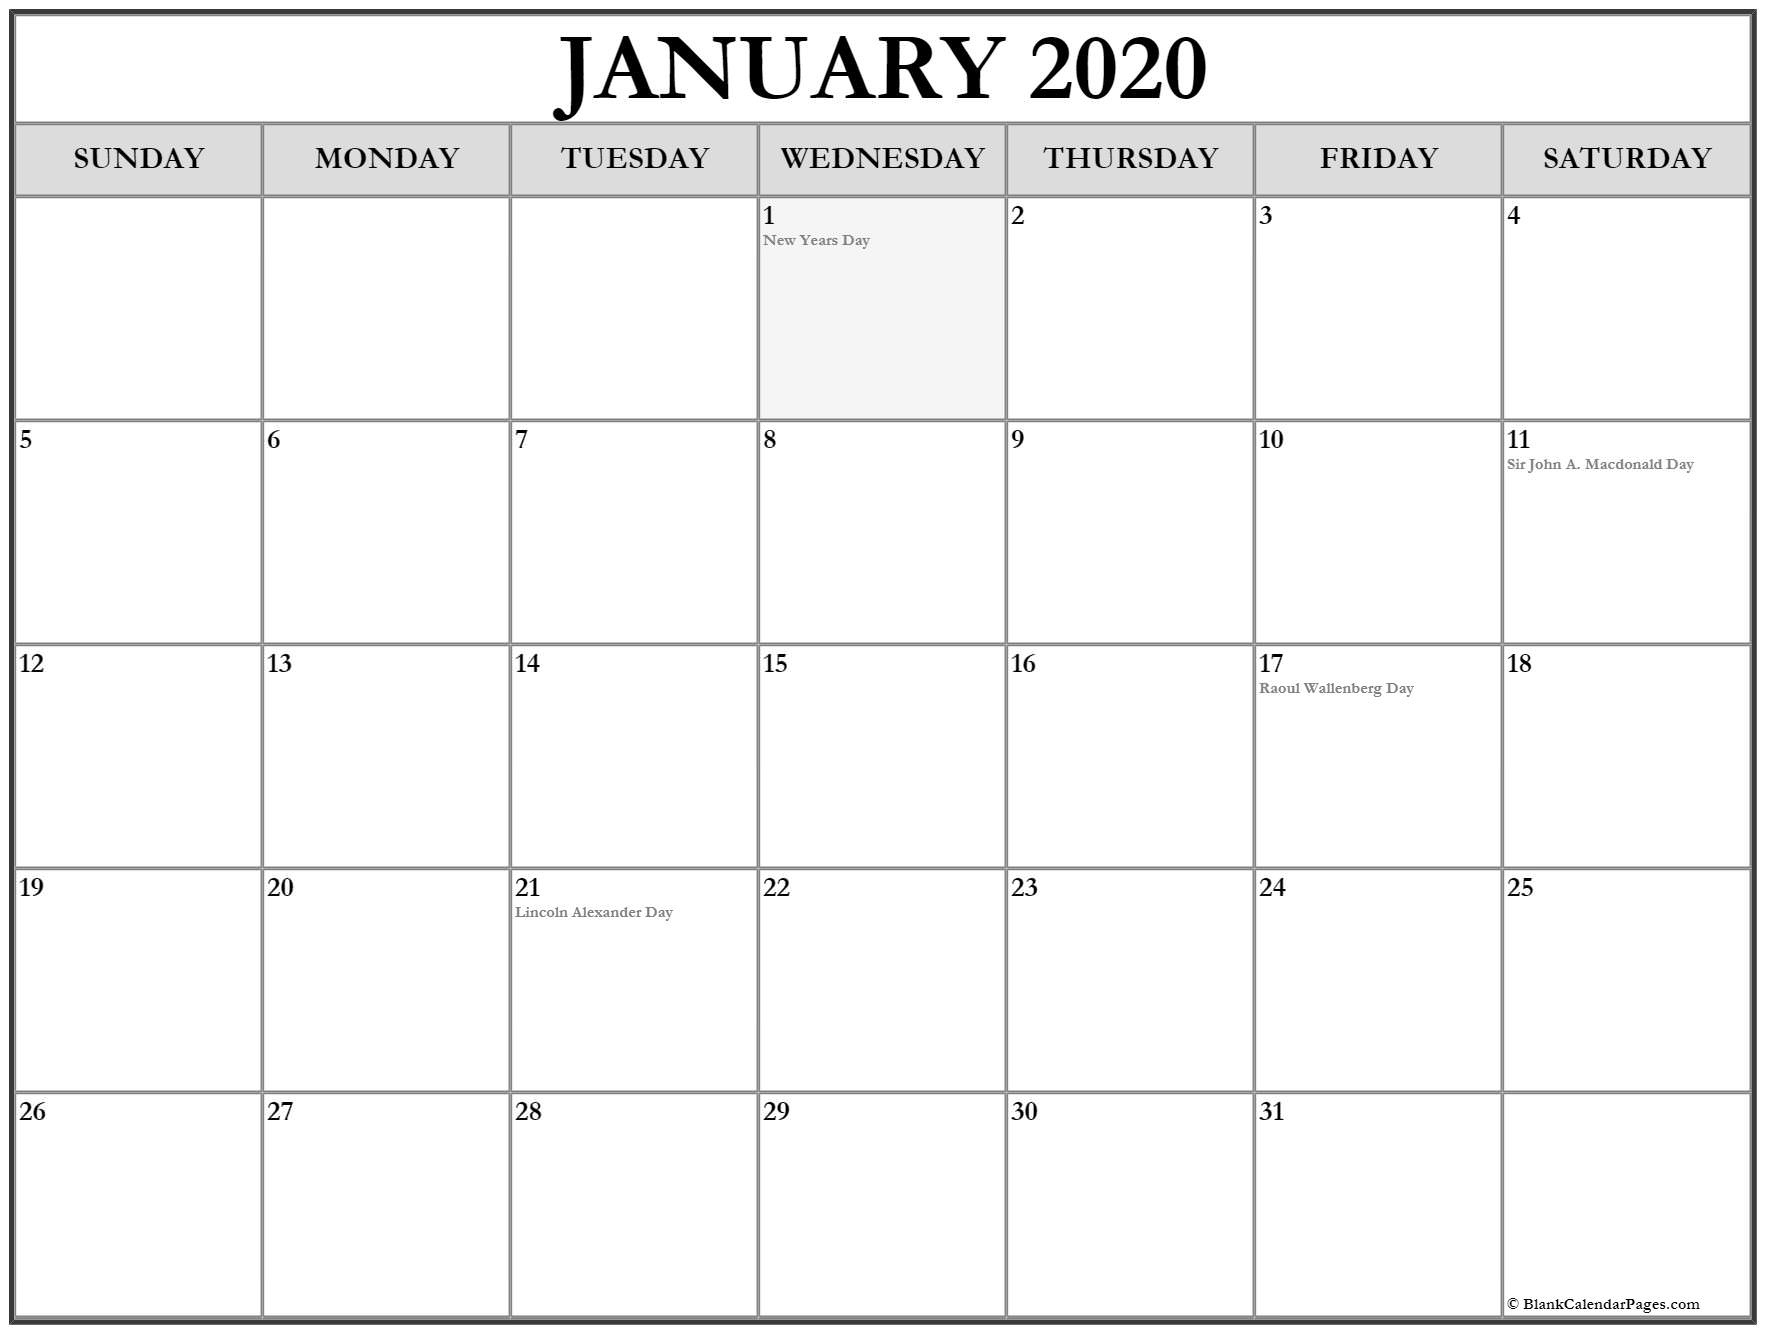 January 2020 Calendar With Holidays | Printable Calendar Remarkable 2020 Calendar With Holidays Canada